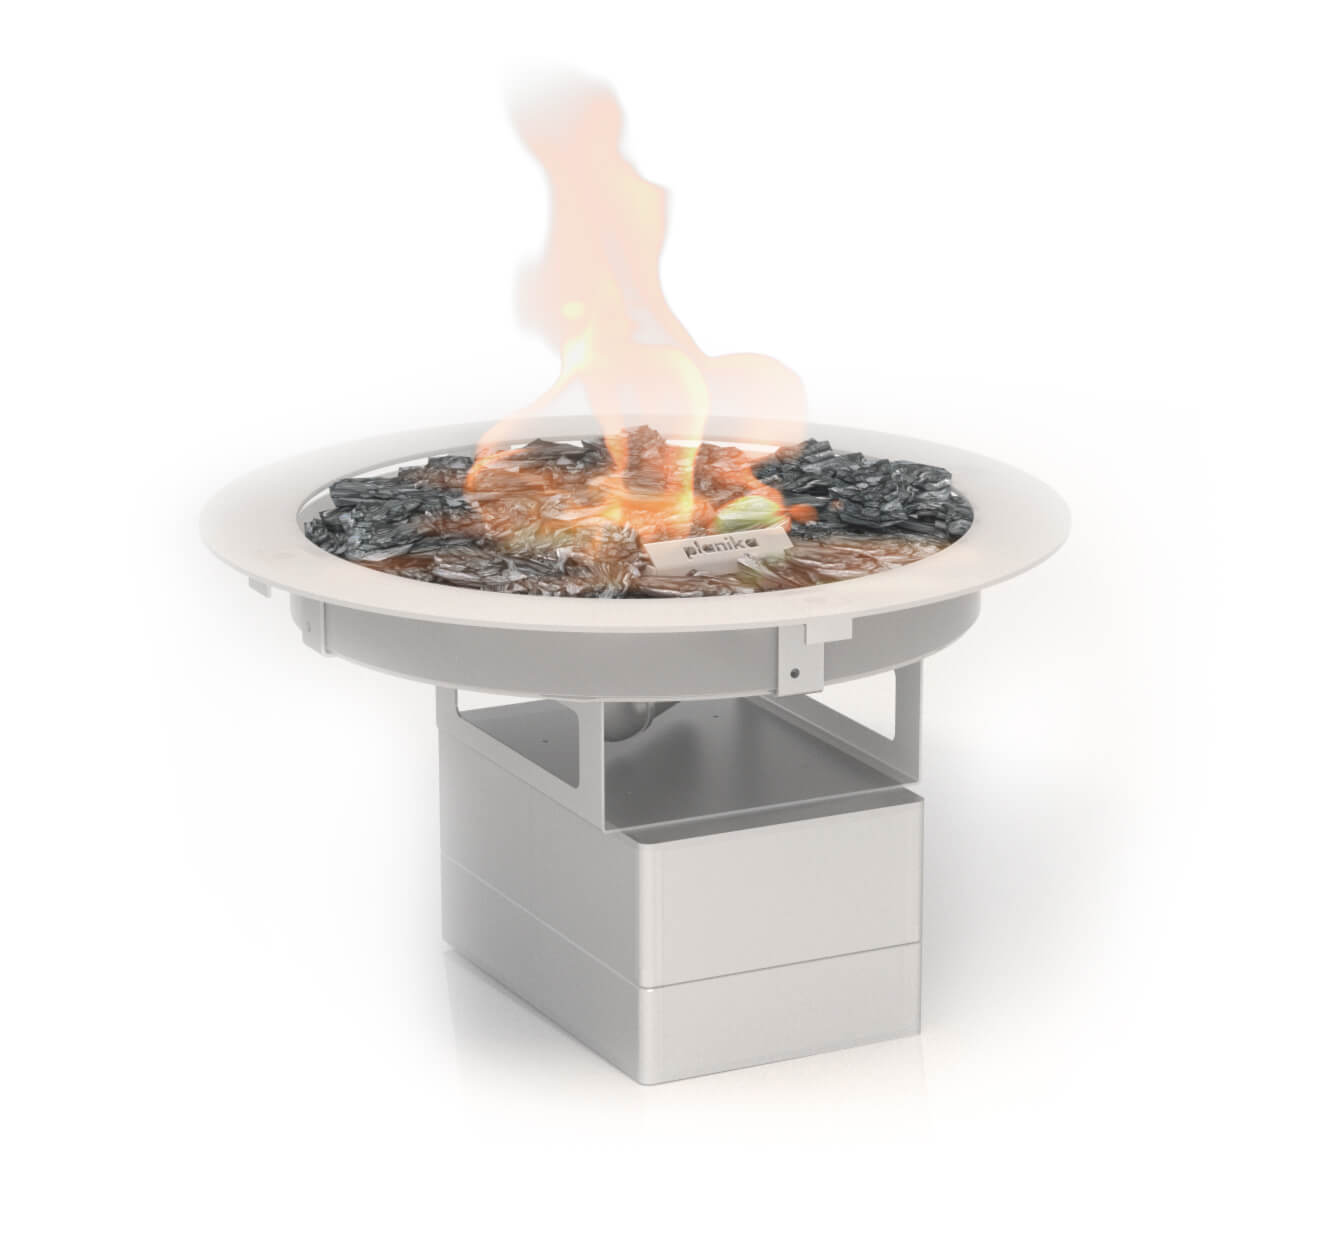 Galio Fire Pit Corten gaspejs indsats